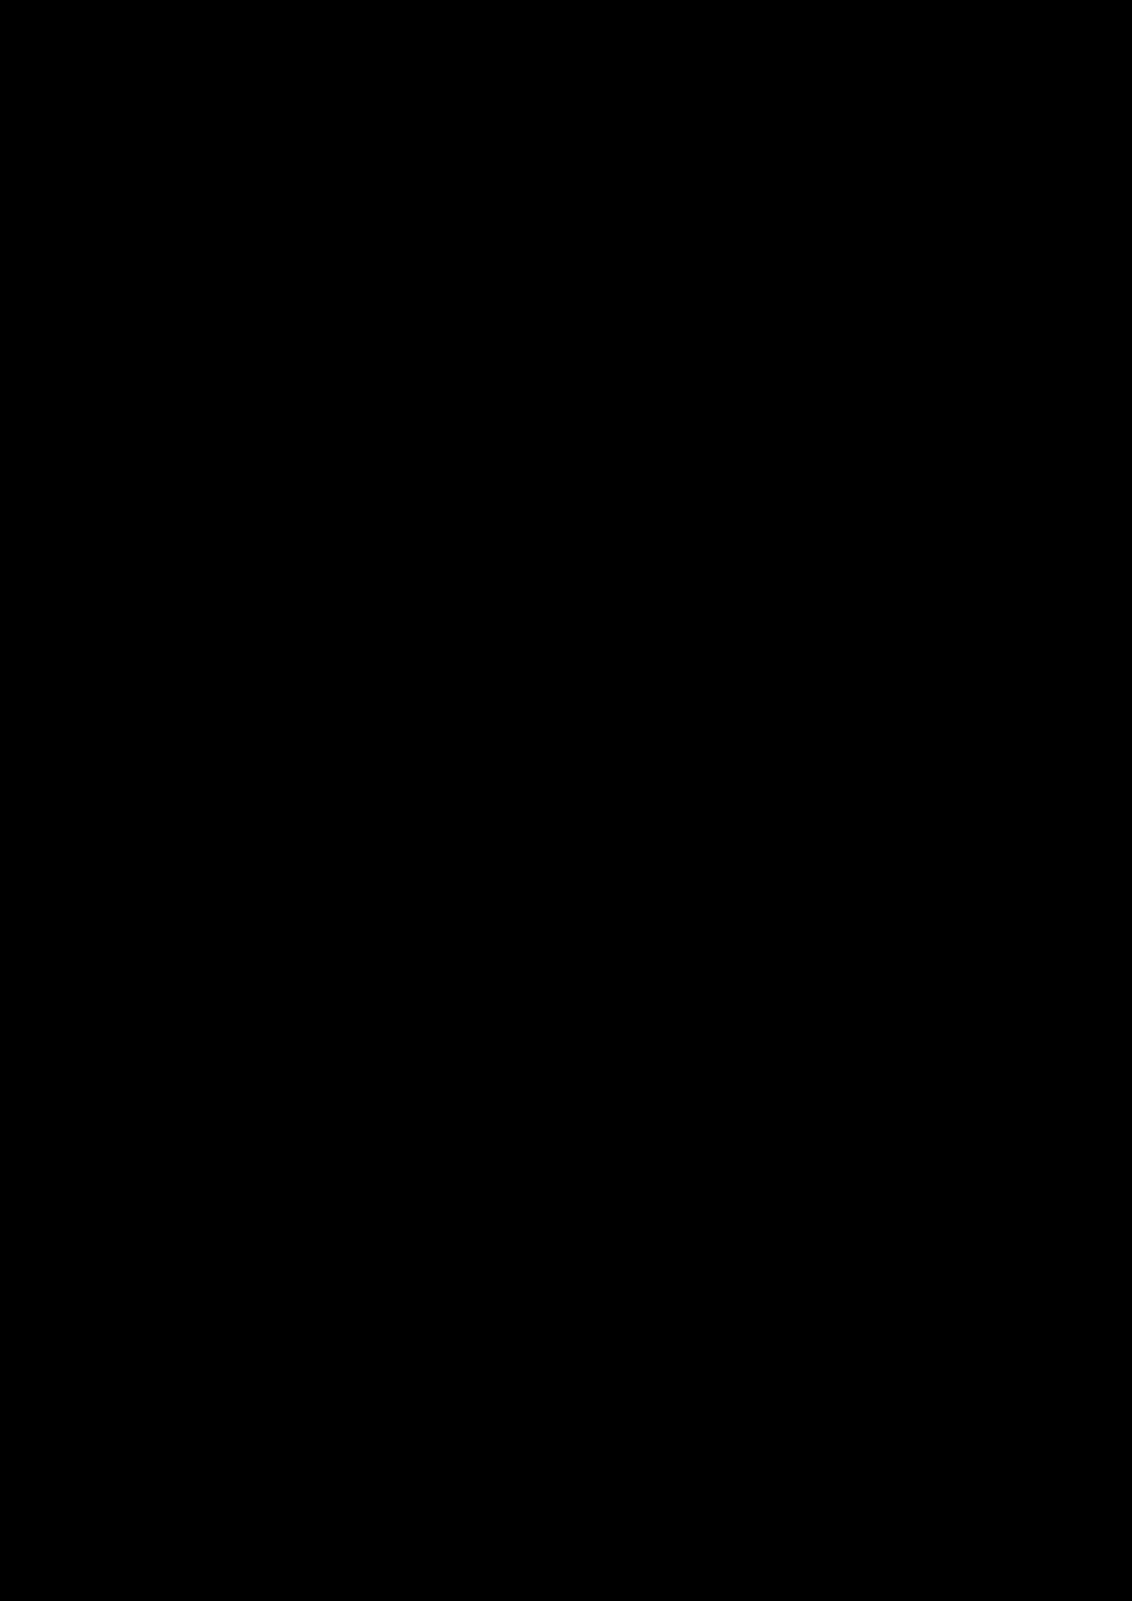 Ispoved Pervogo Boga slide, Image 19